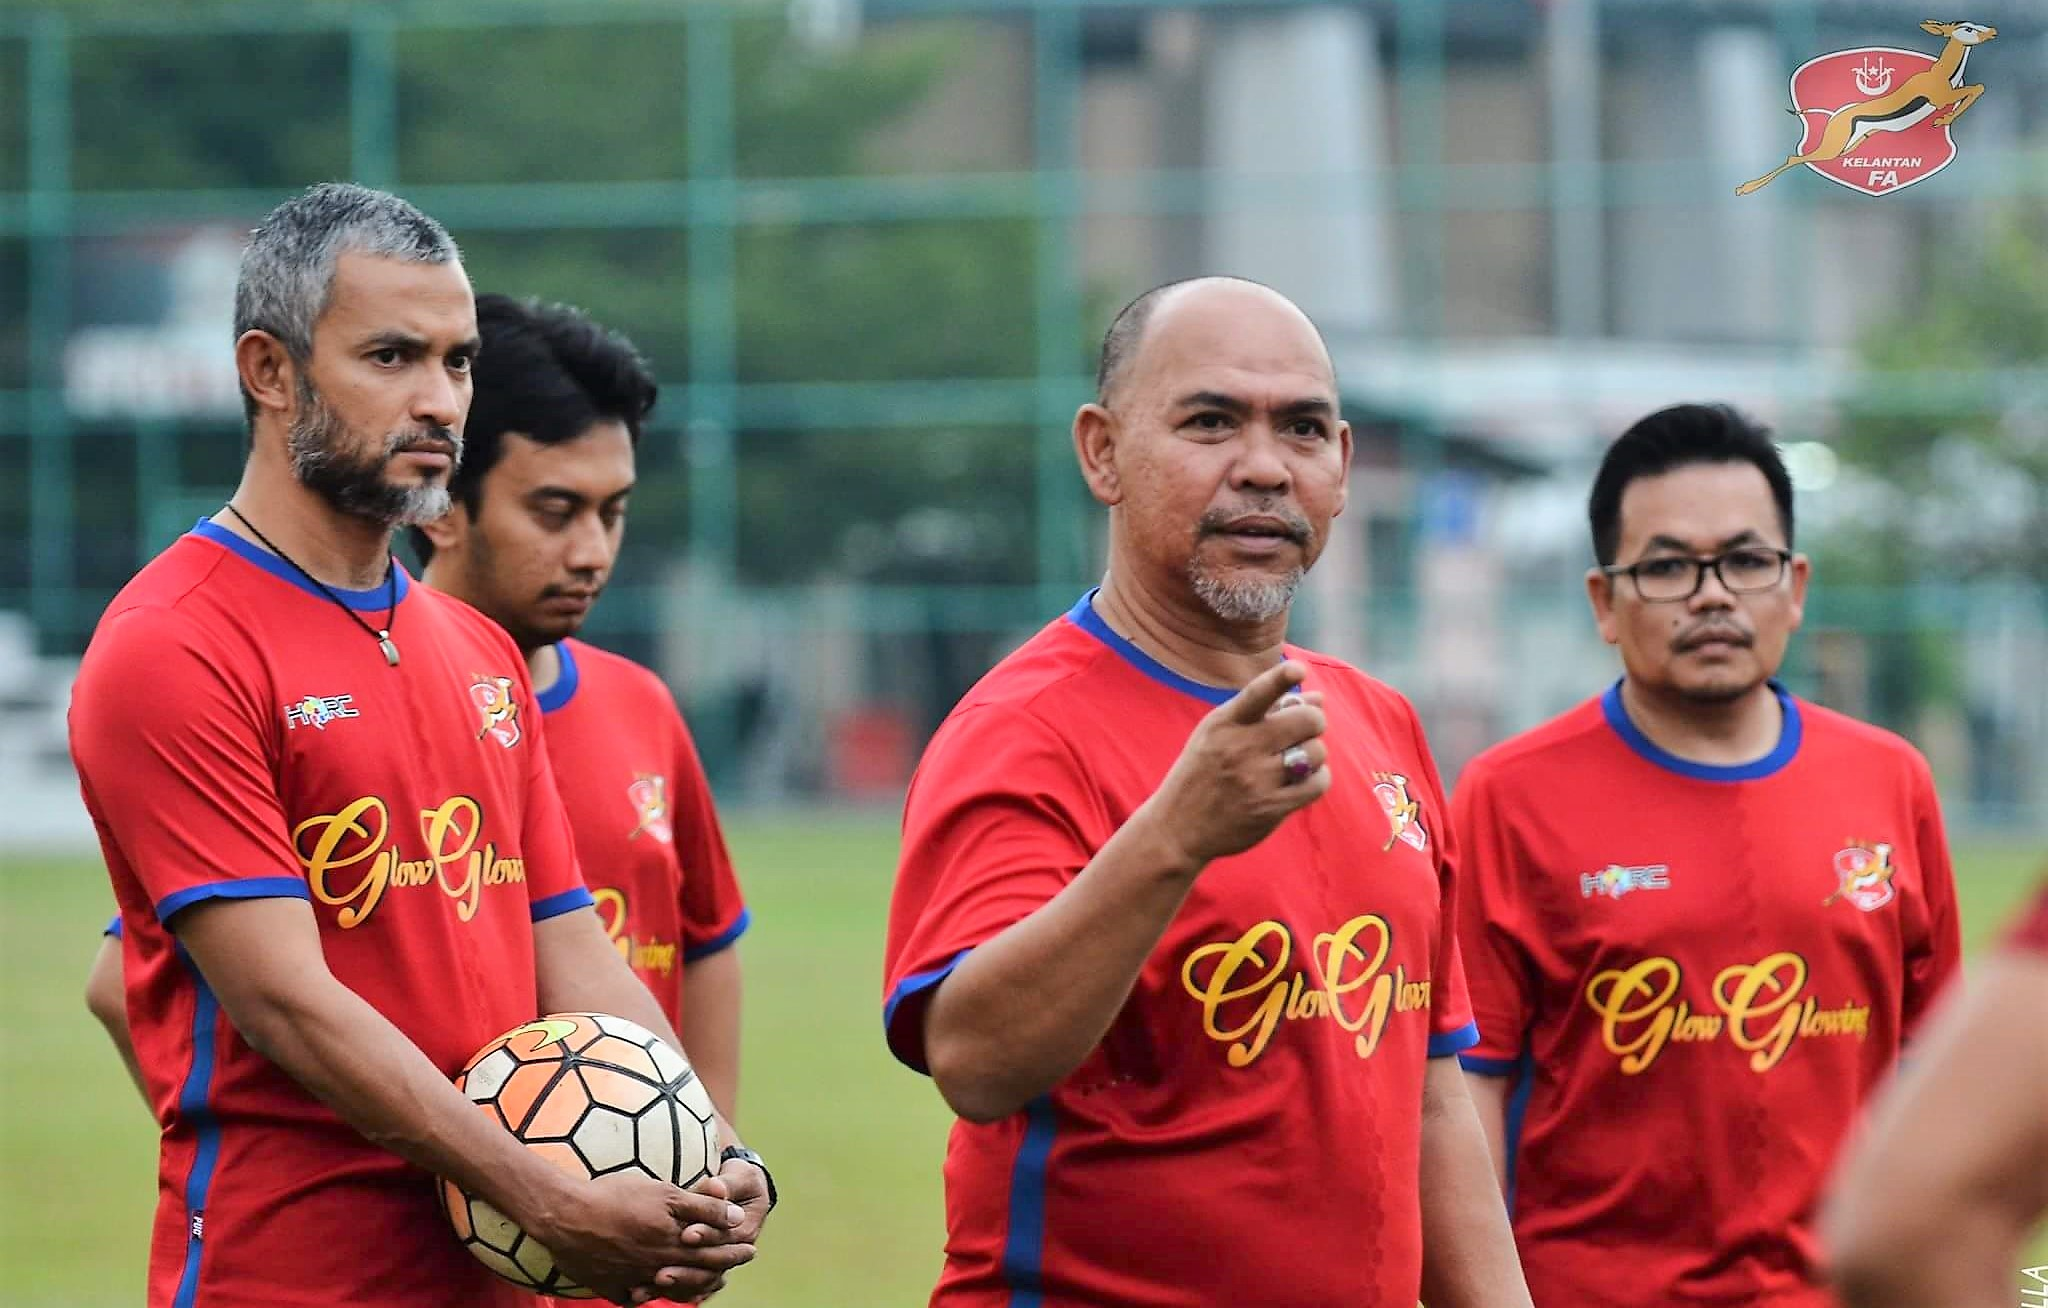 Kelantan head coach (second from right) Zahasmi Ismail and assistant head coach Hashim Mustapha (left) 13/1/2017